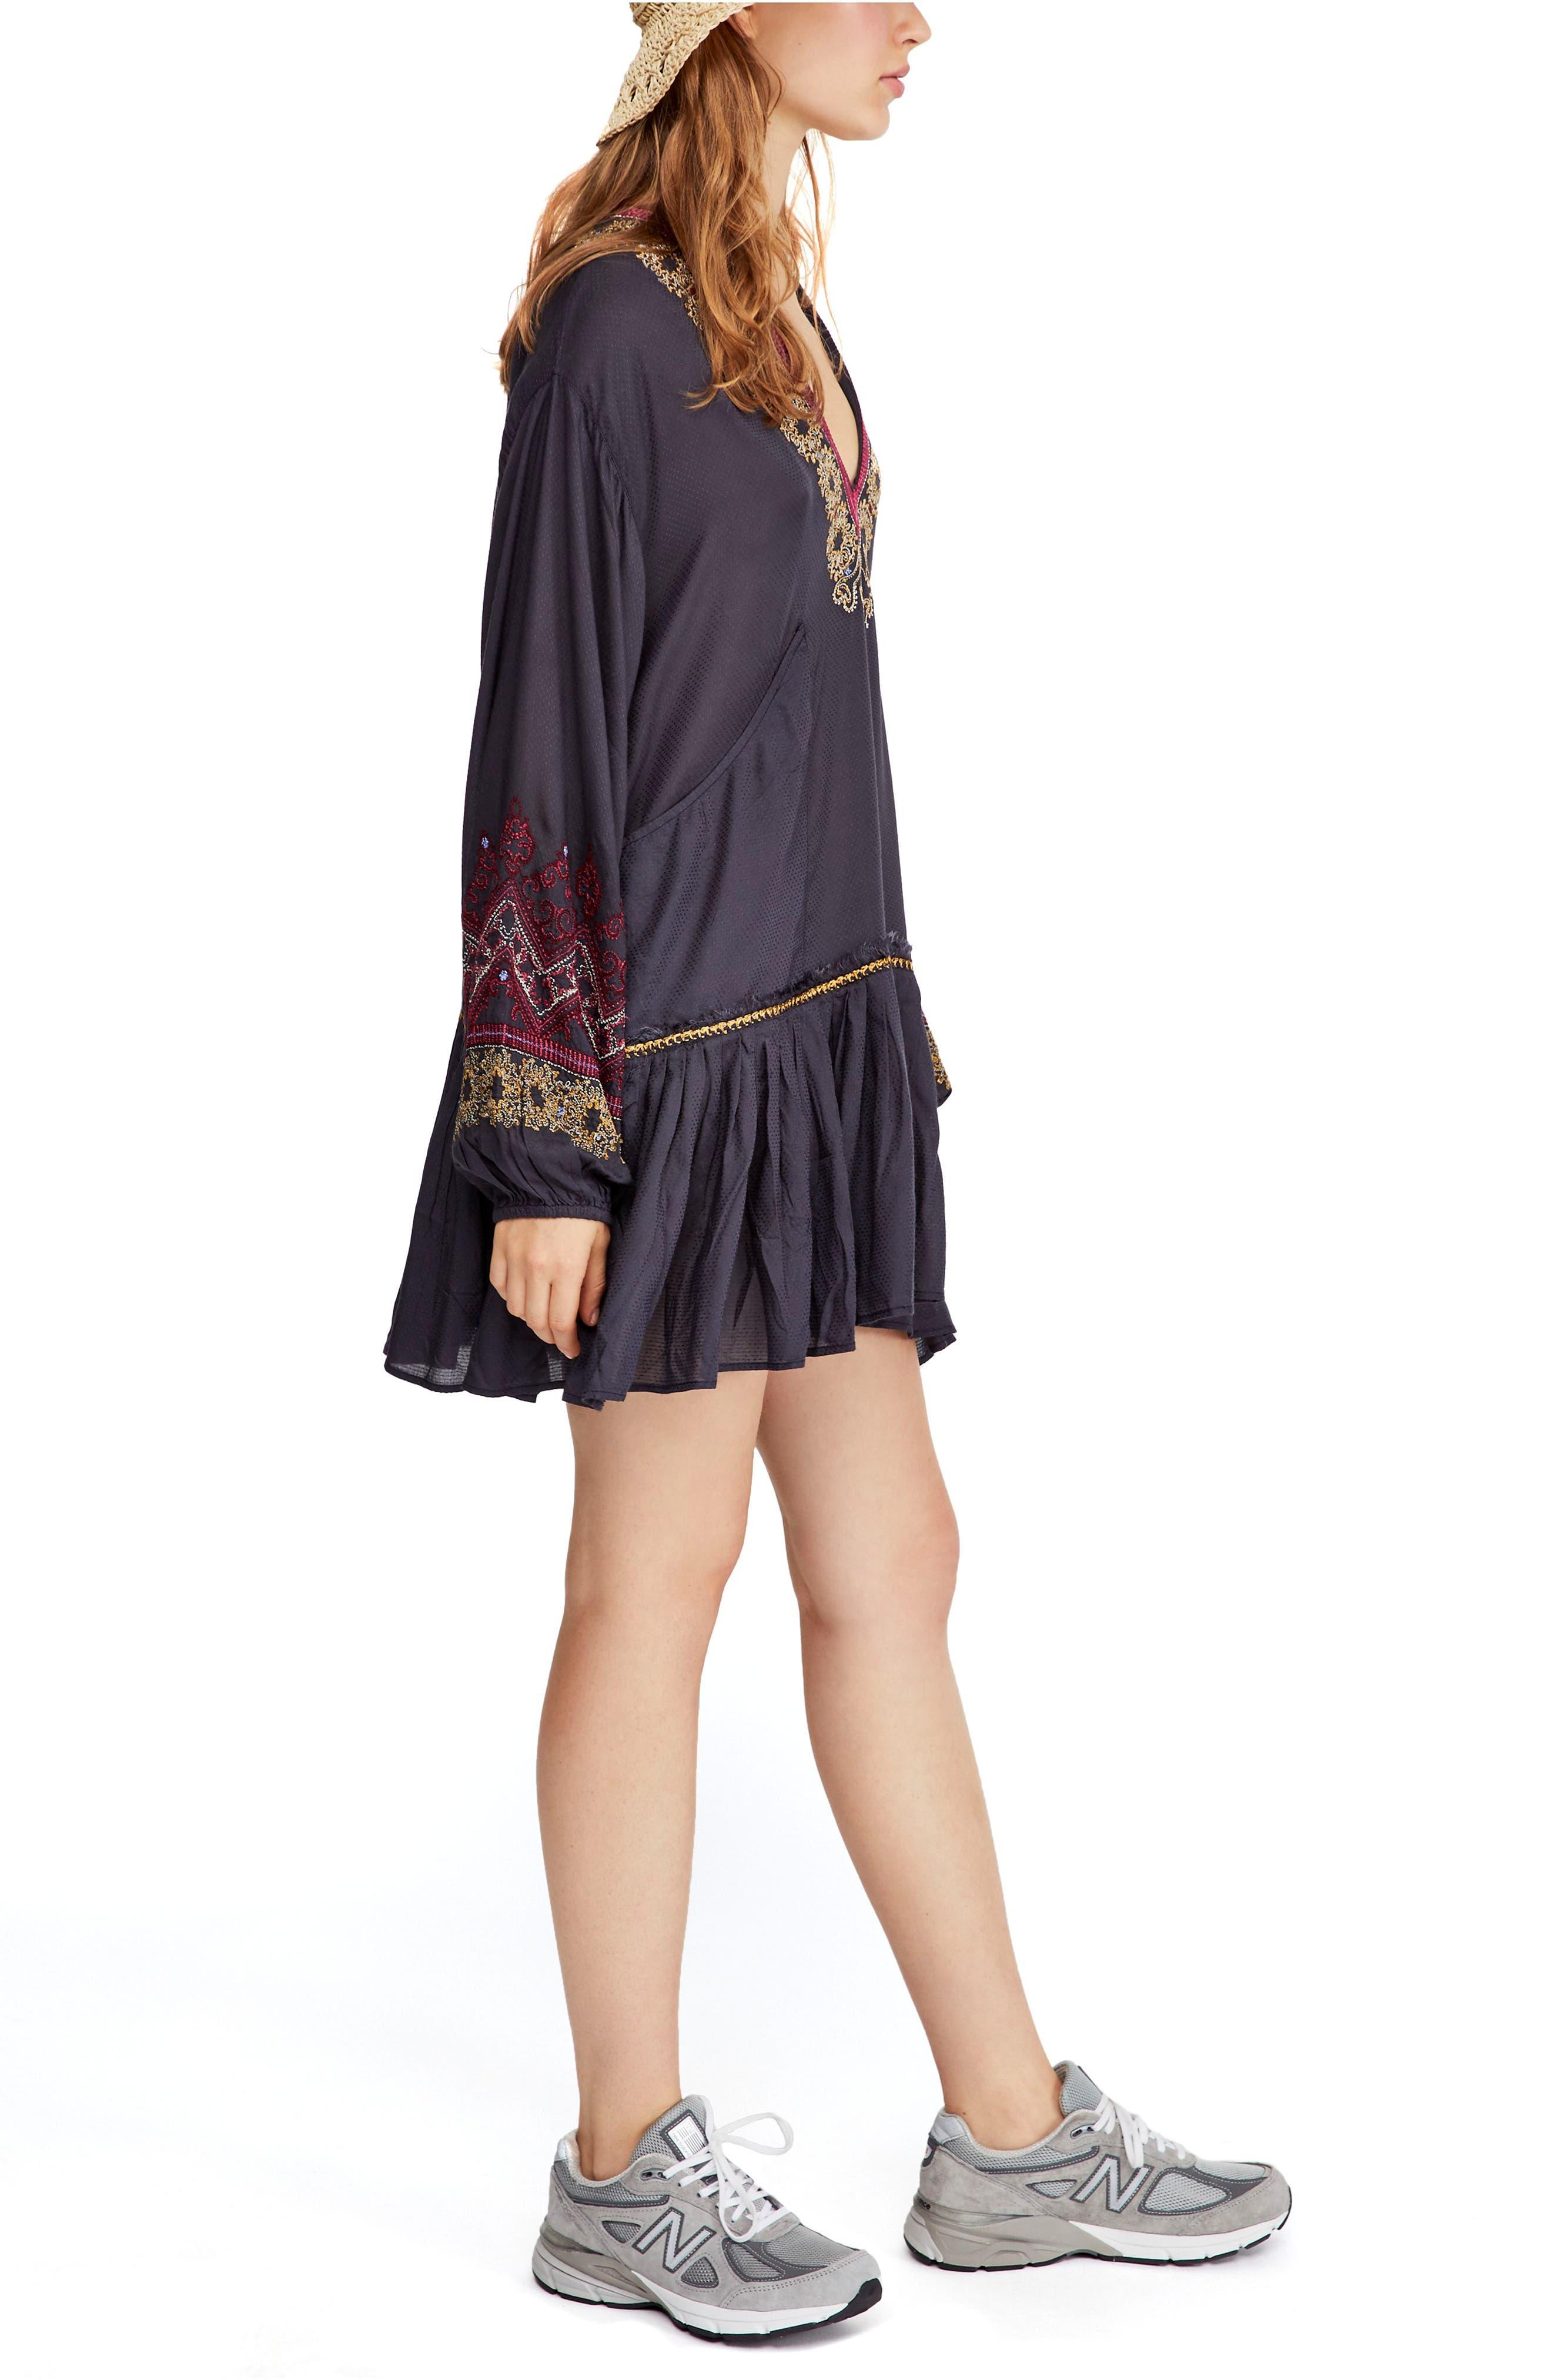 Wild One Embellished Dress,                             Alternate thumbnail 3, color,                             BLACK